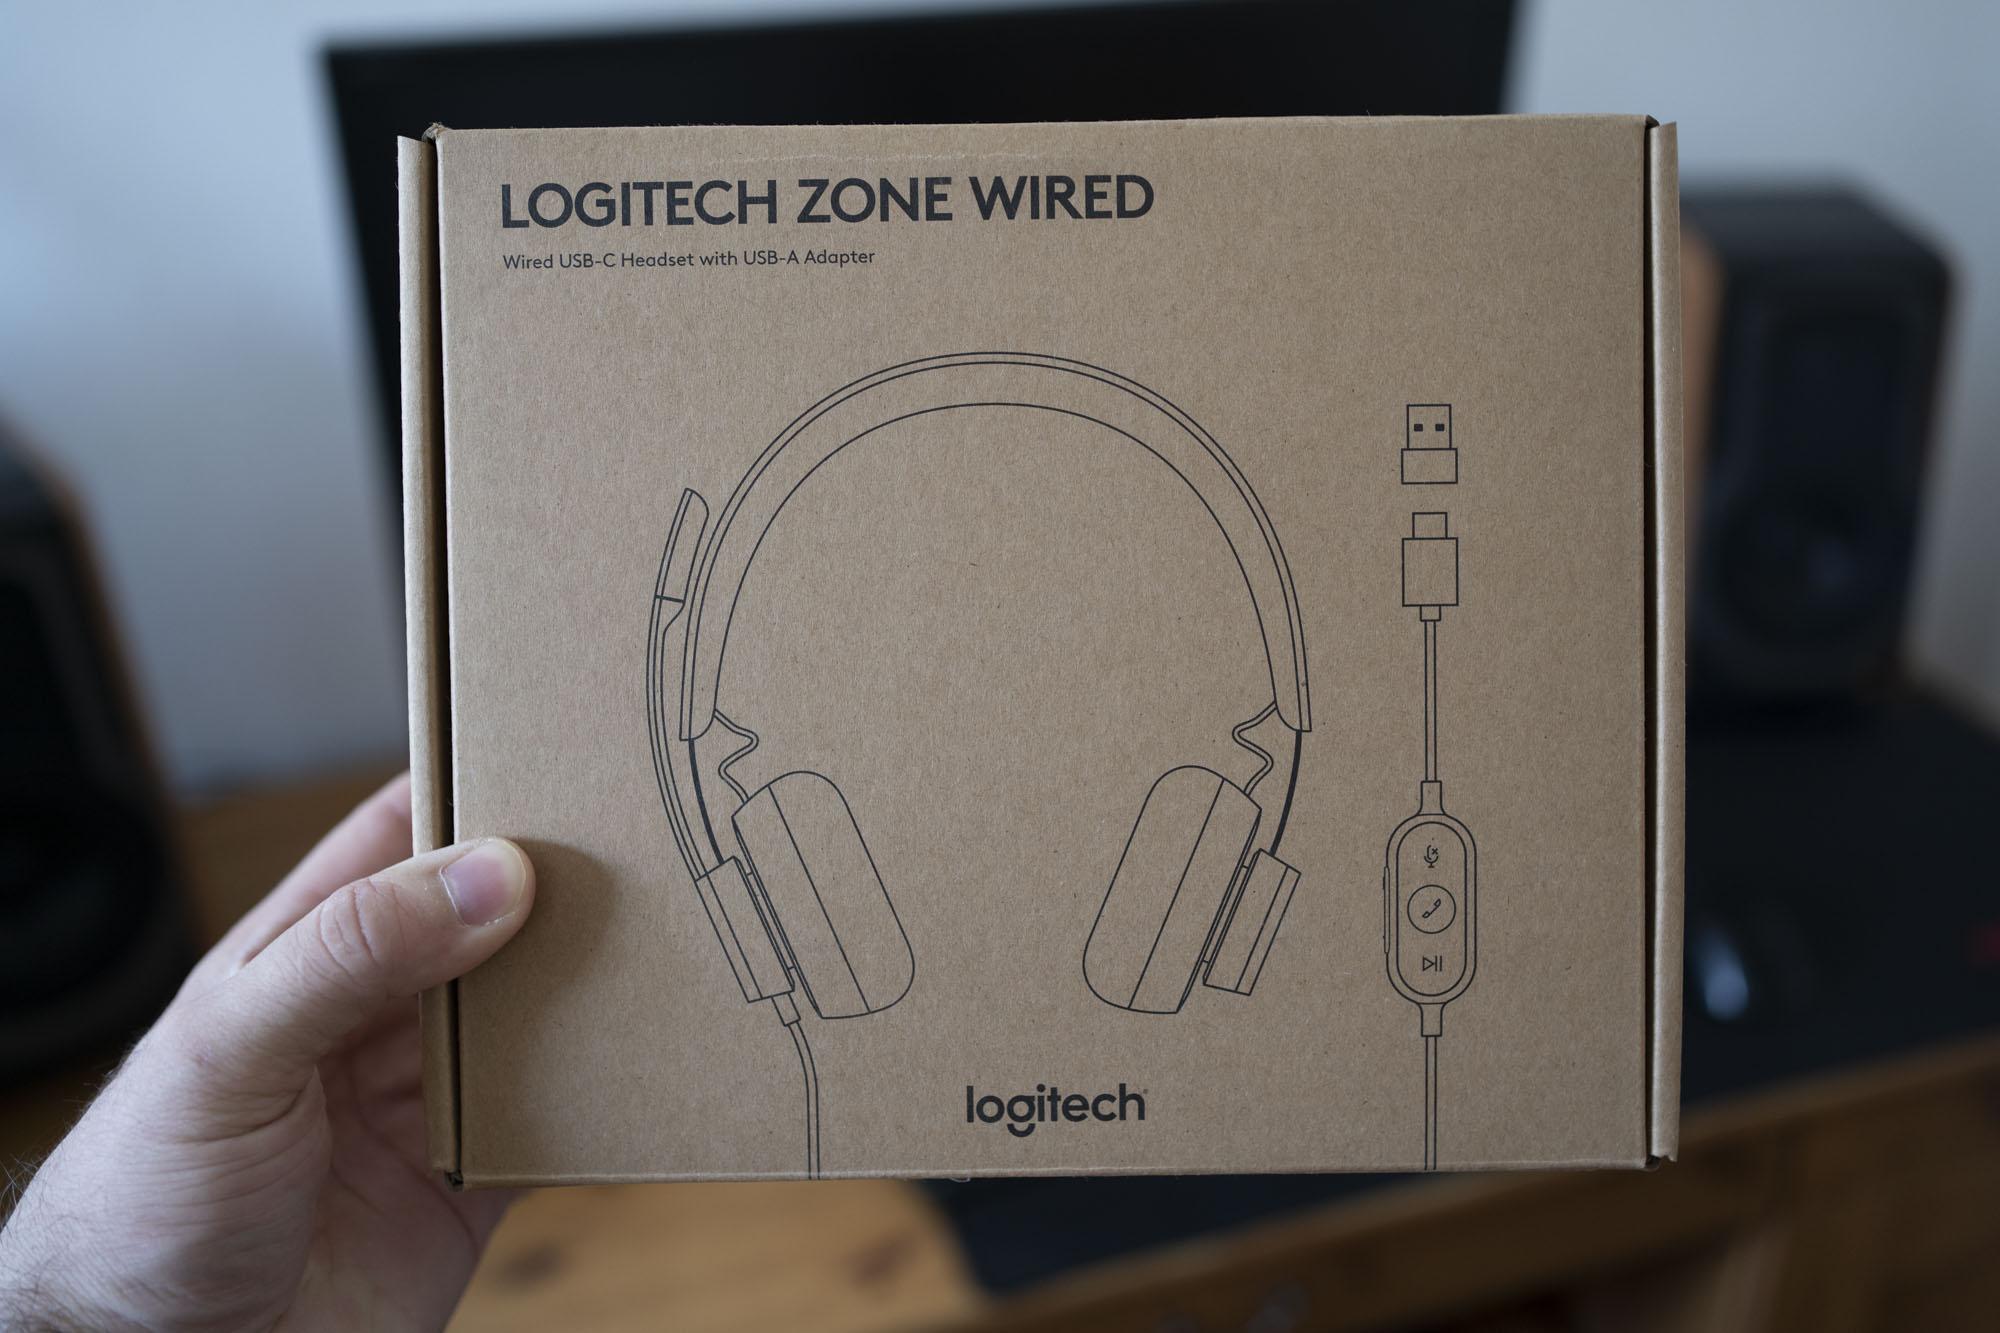 Logitech Zone Wired